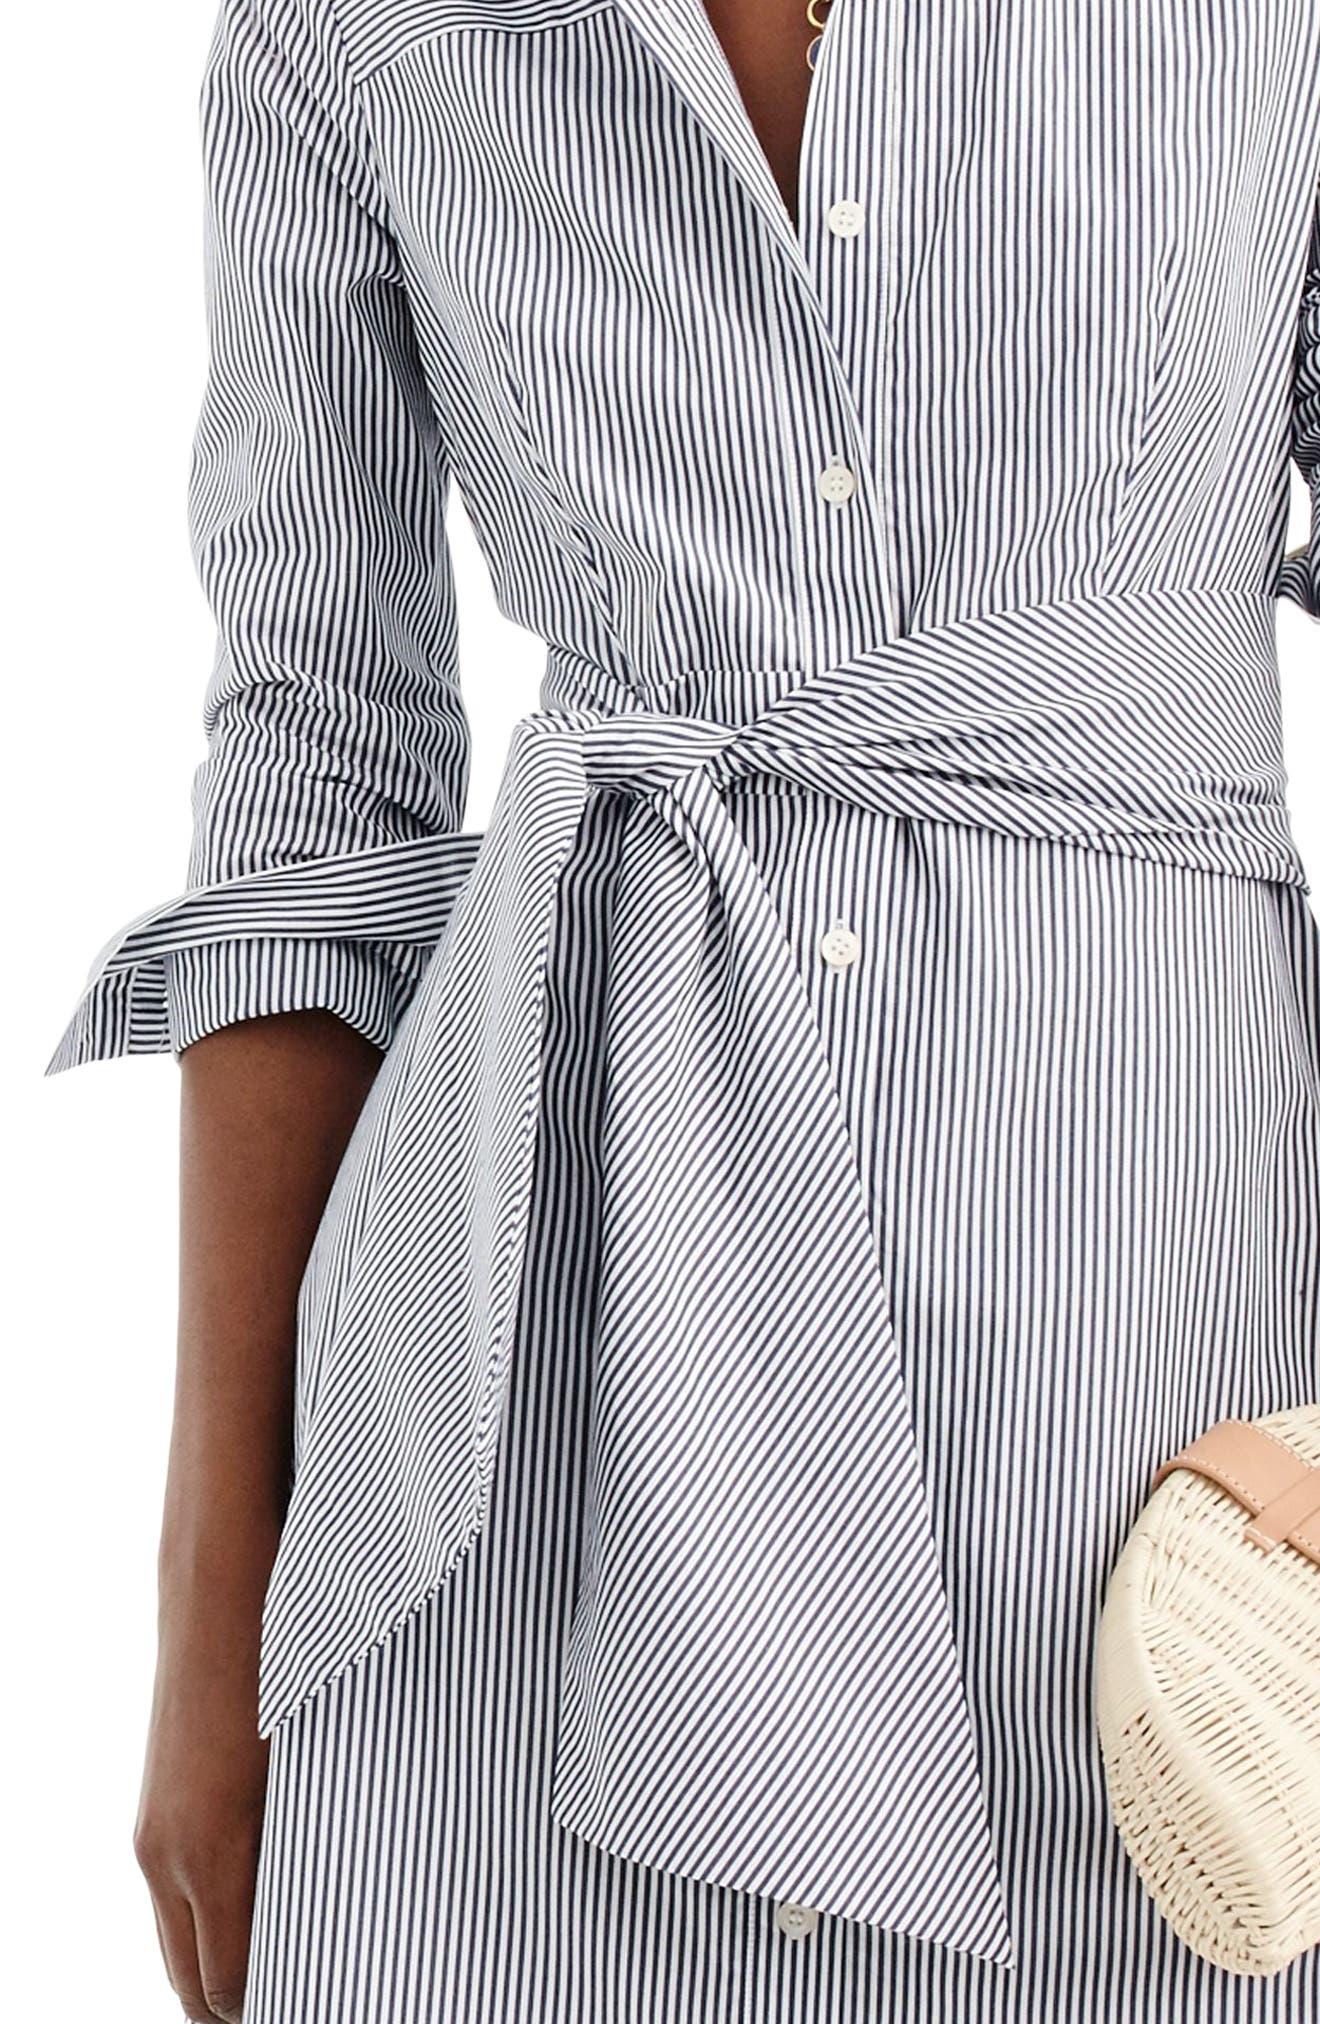 Alternate Image 2  - J.Crew Maribou Stripe Cotton Shirtdress (Regular & Petite)